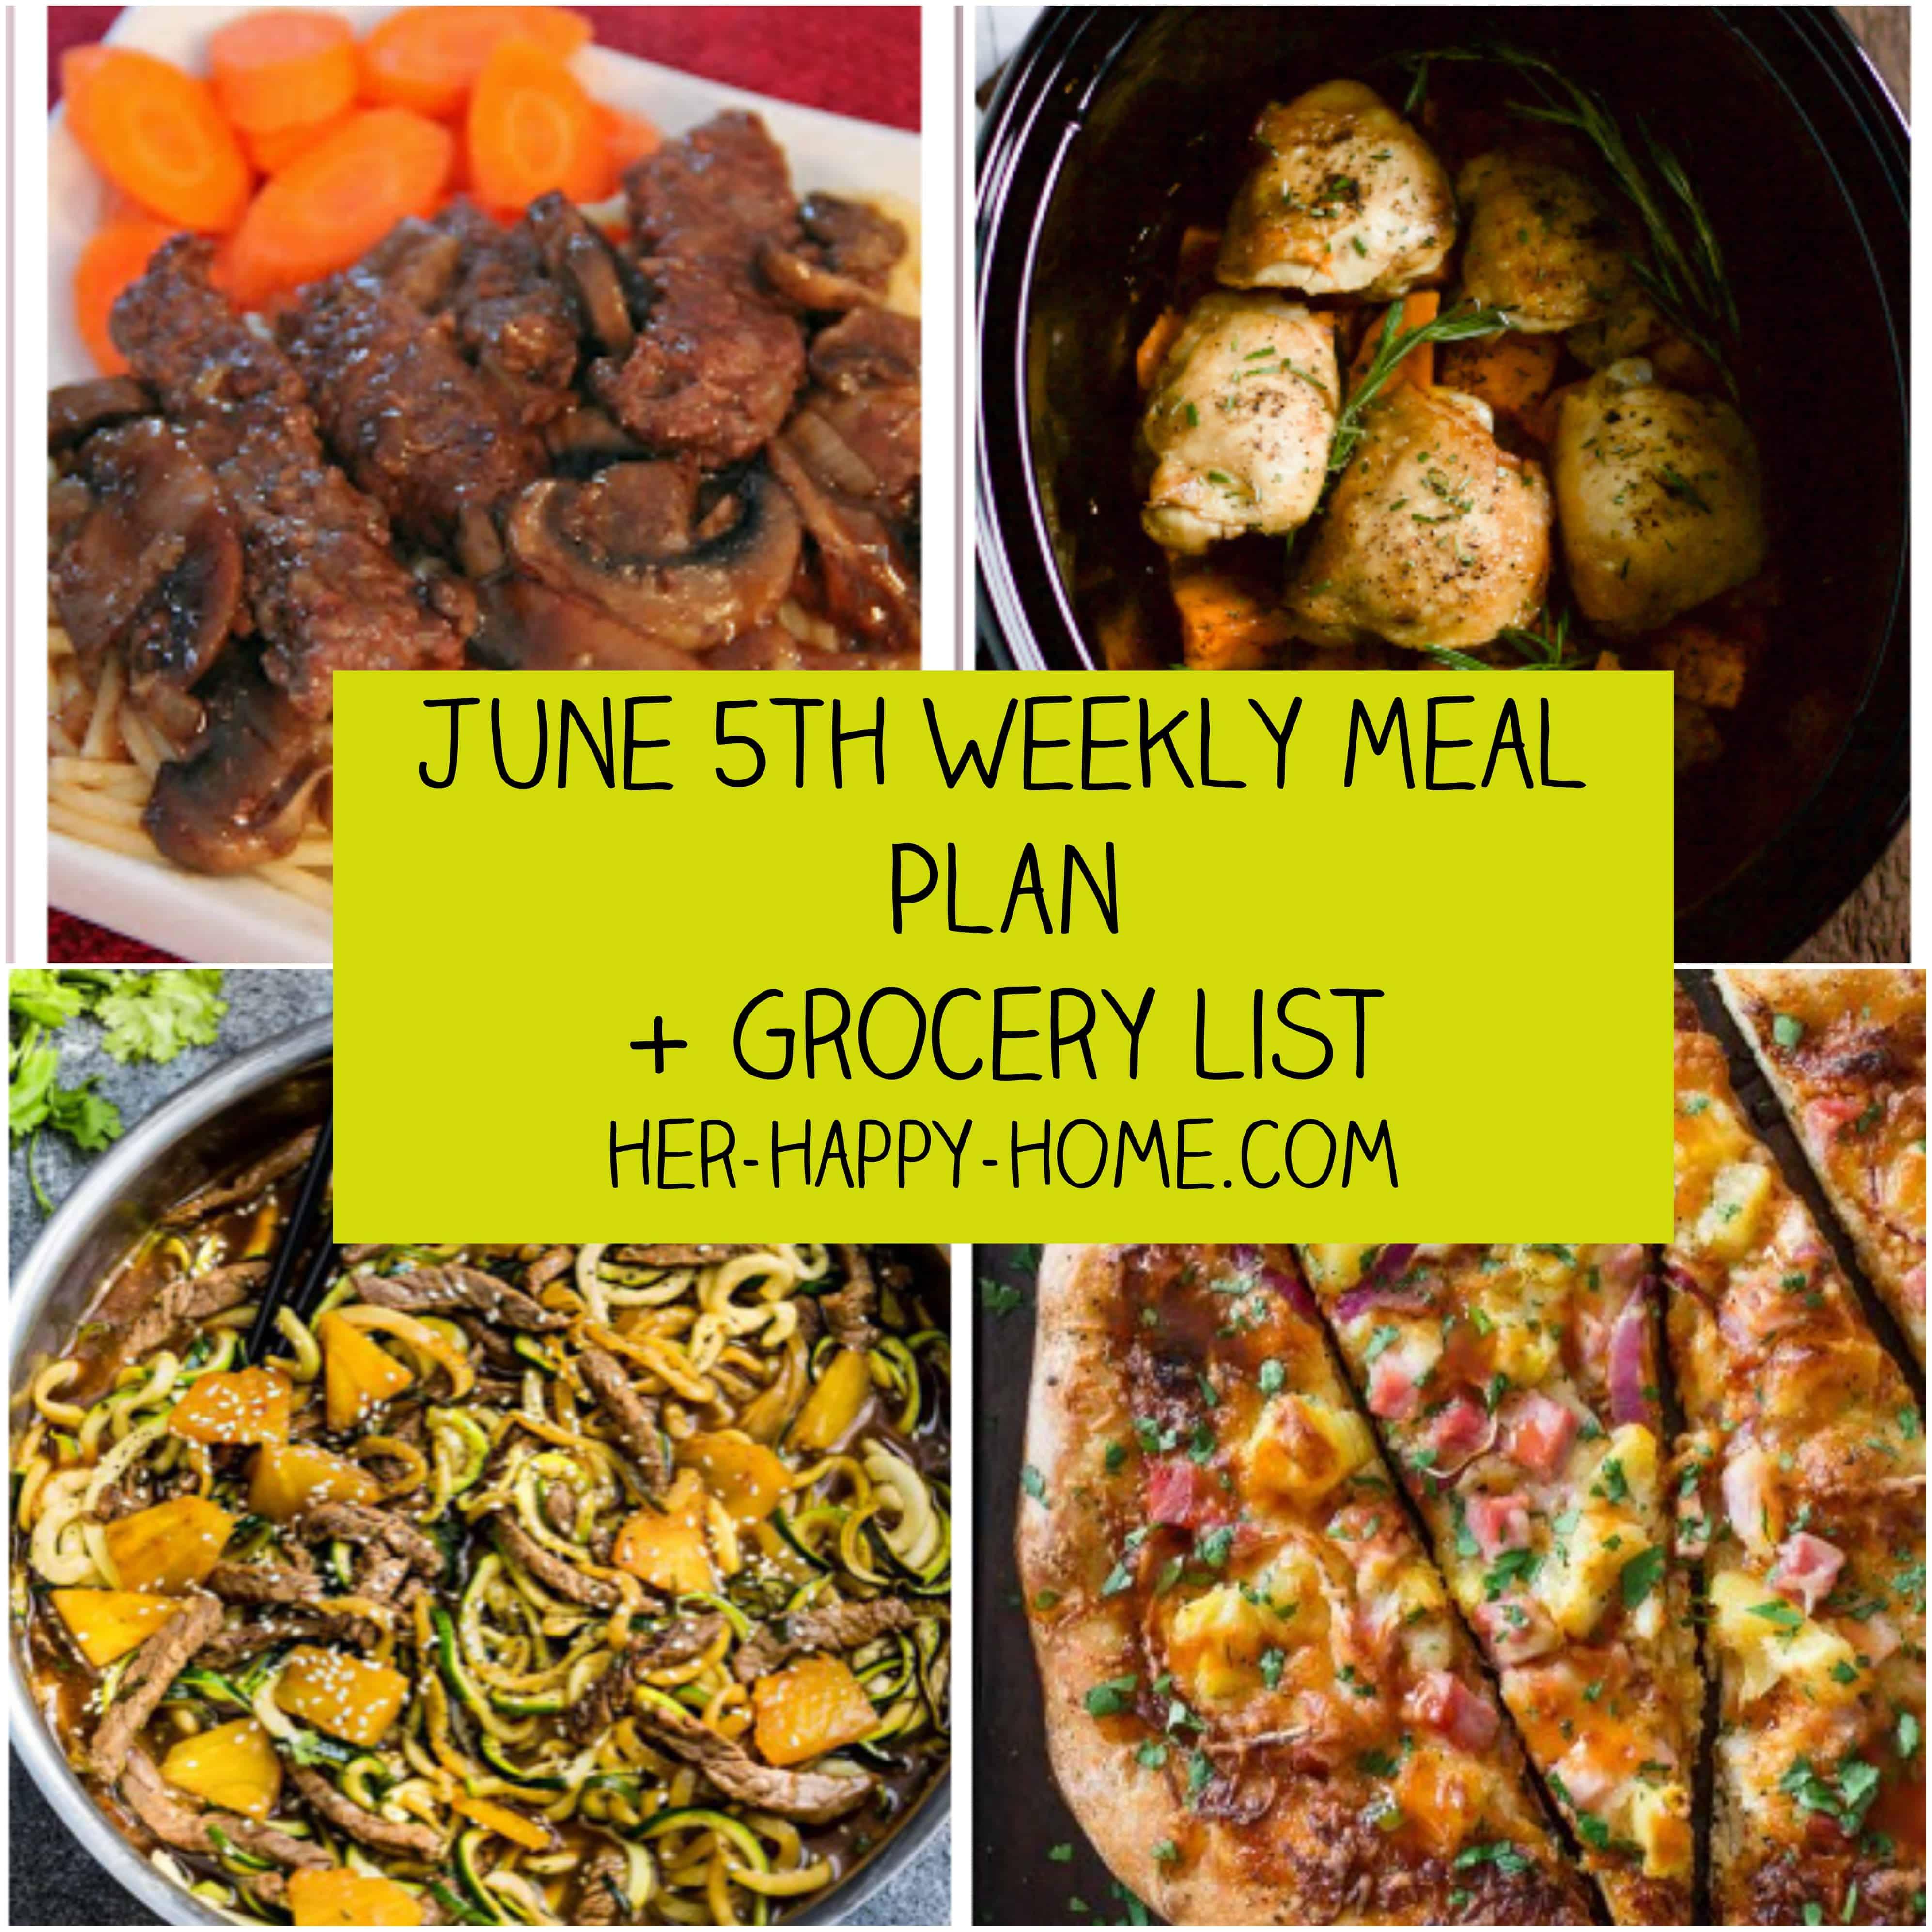 June 5th Weekly Meal Plan + Grocery List